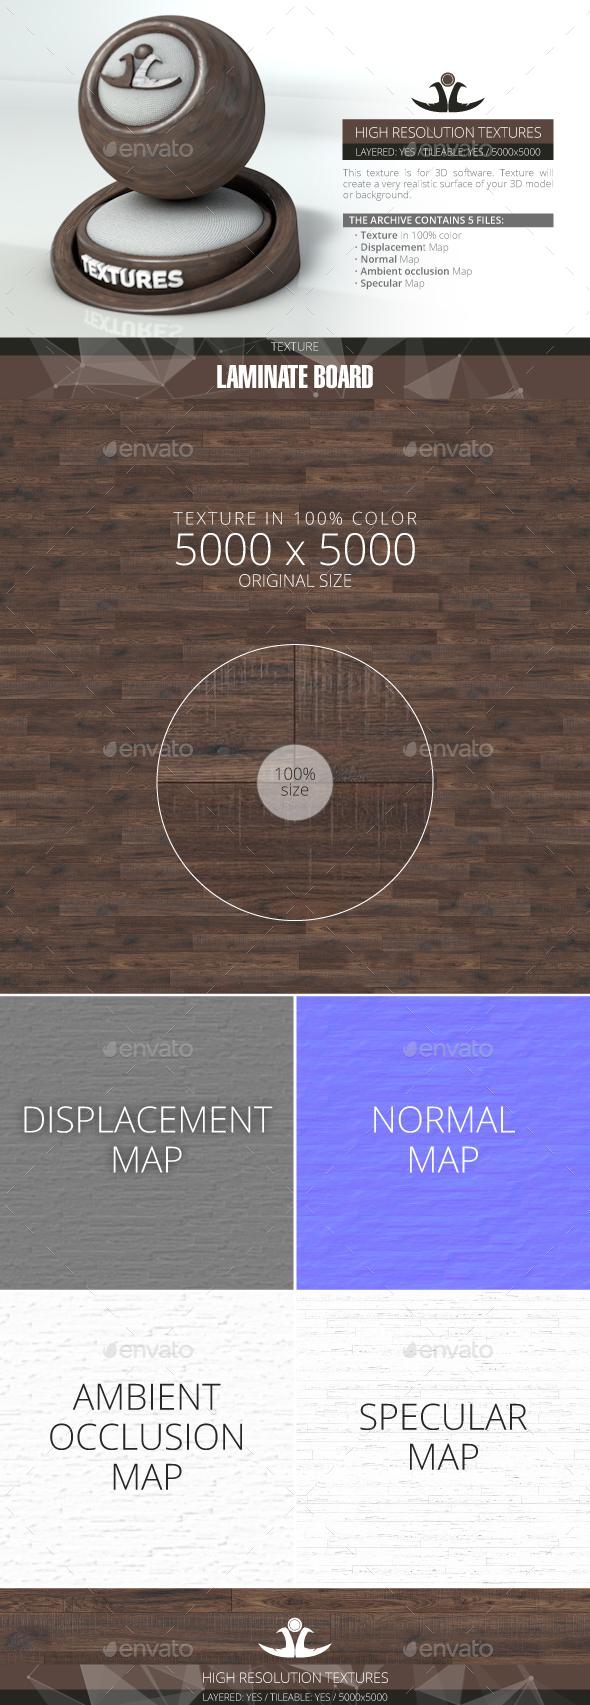 Laminate Board 86 - 3DOcean Item for Sale